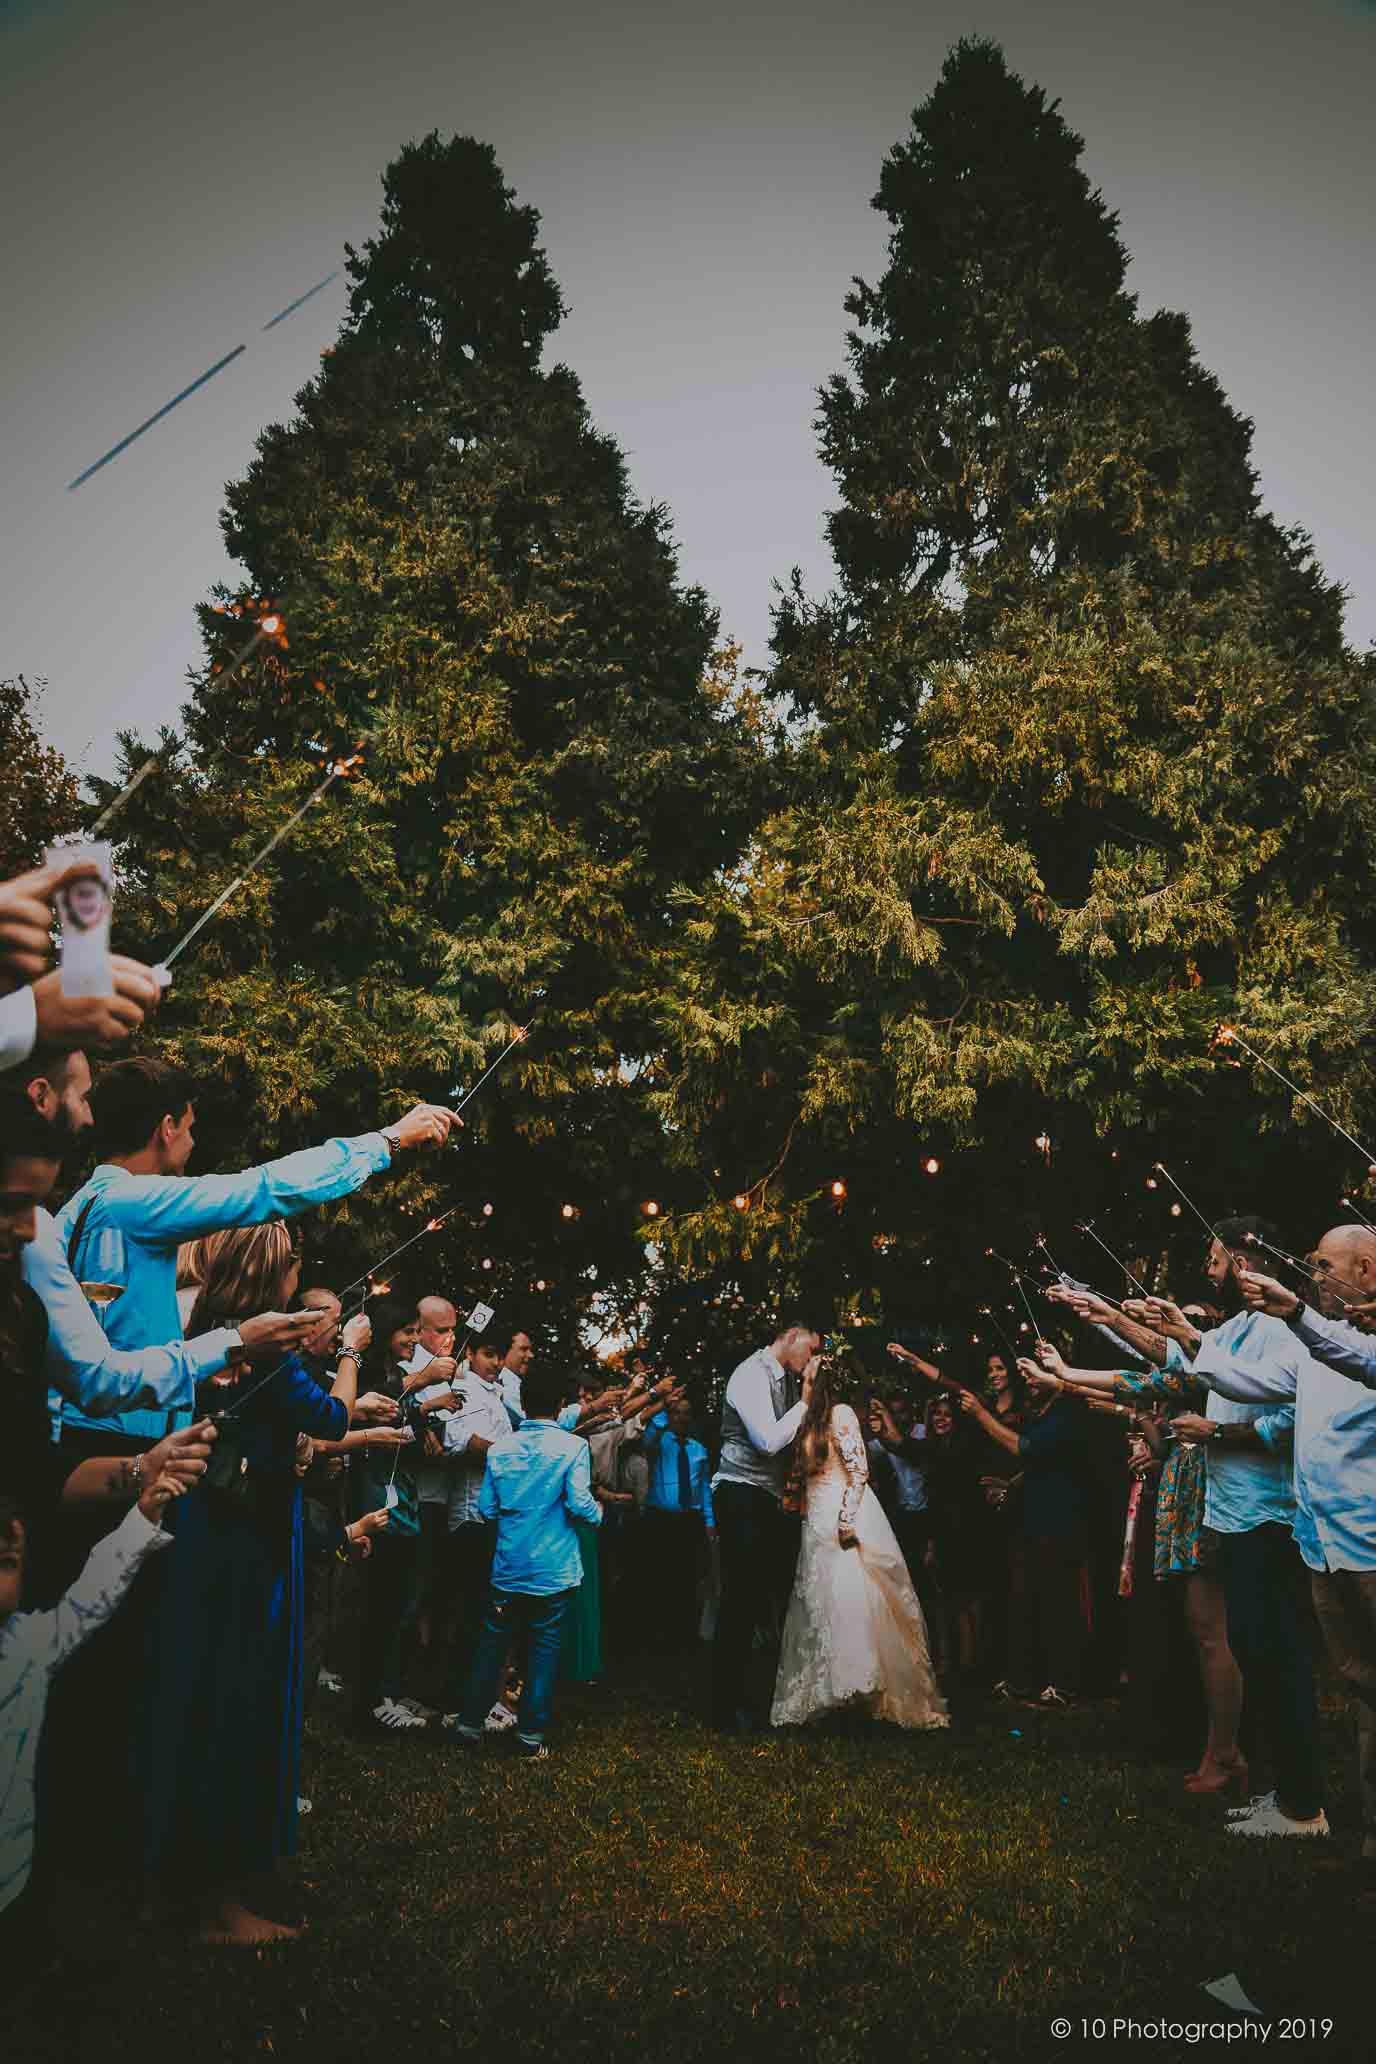 Matrimonio fai da te boho chic autunnale a Modena